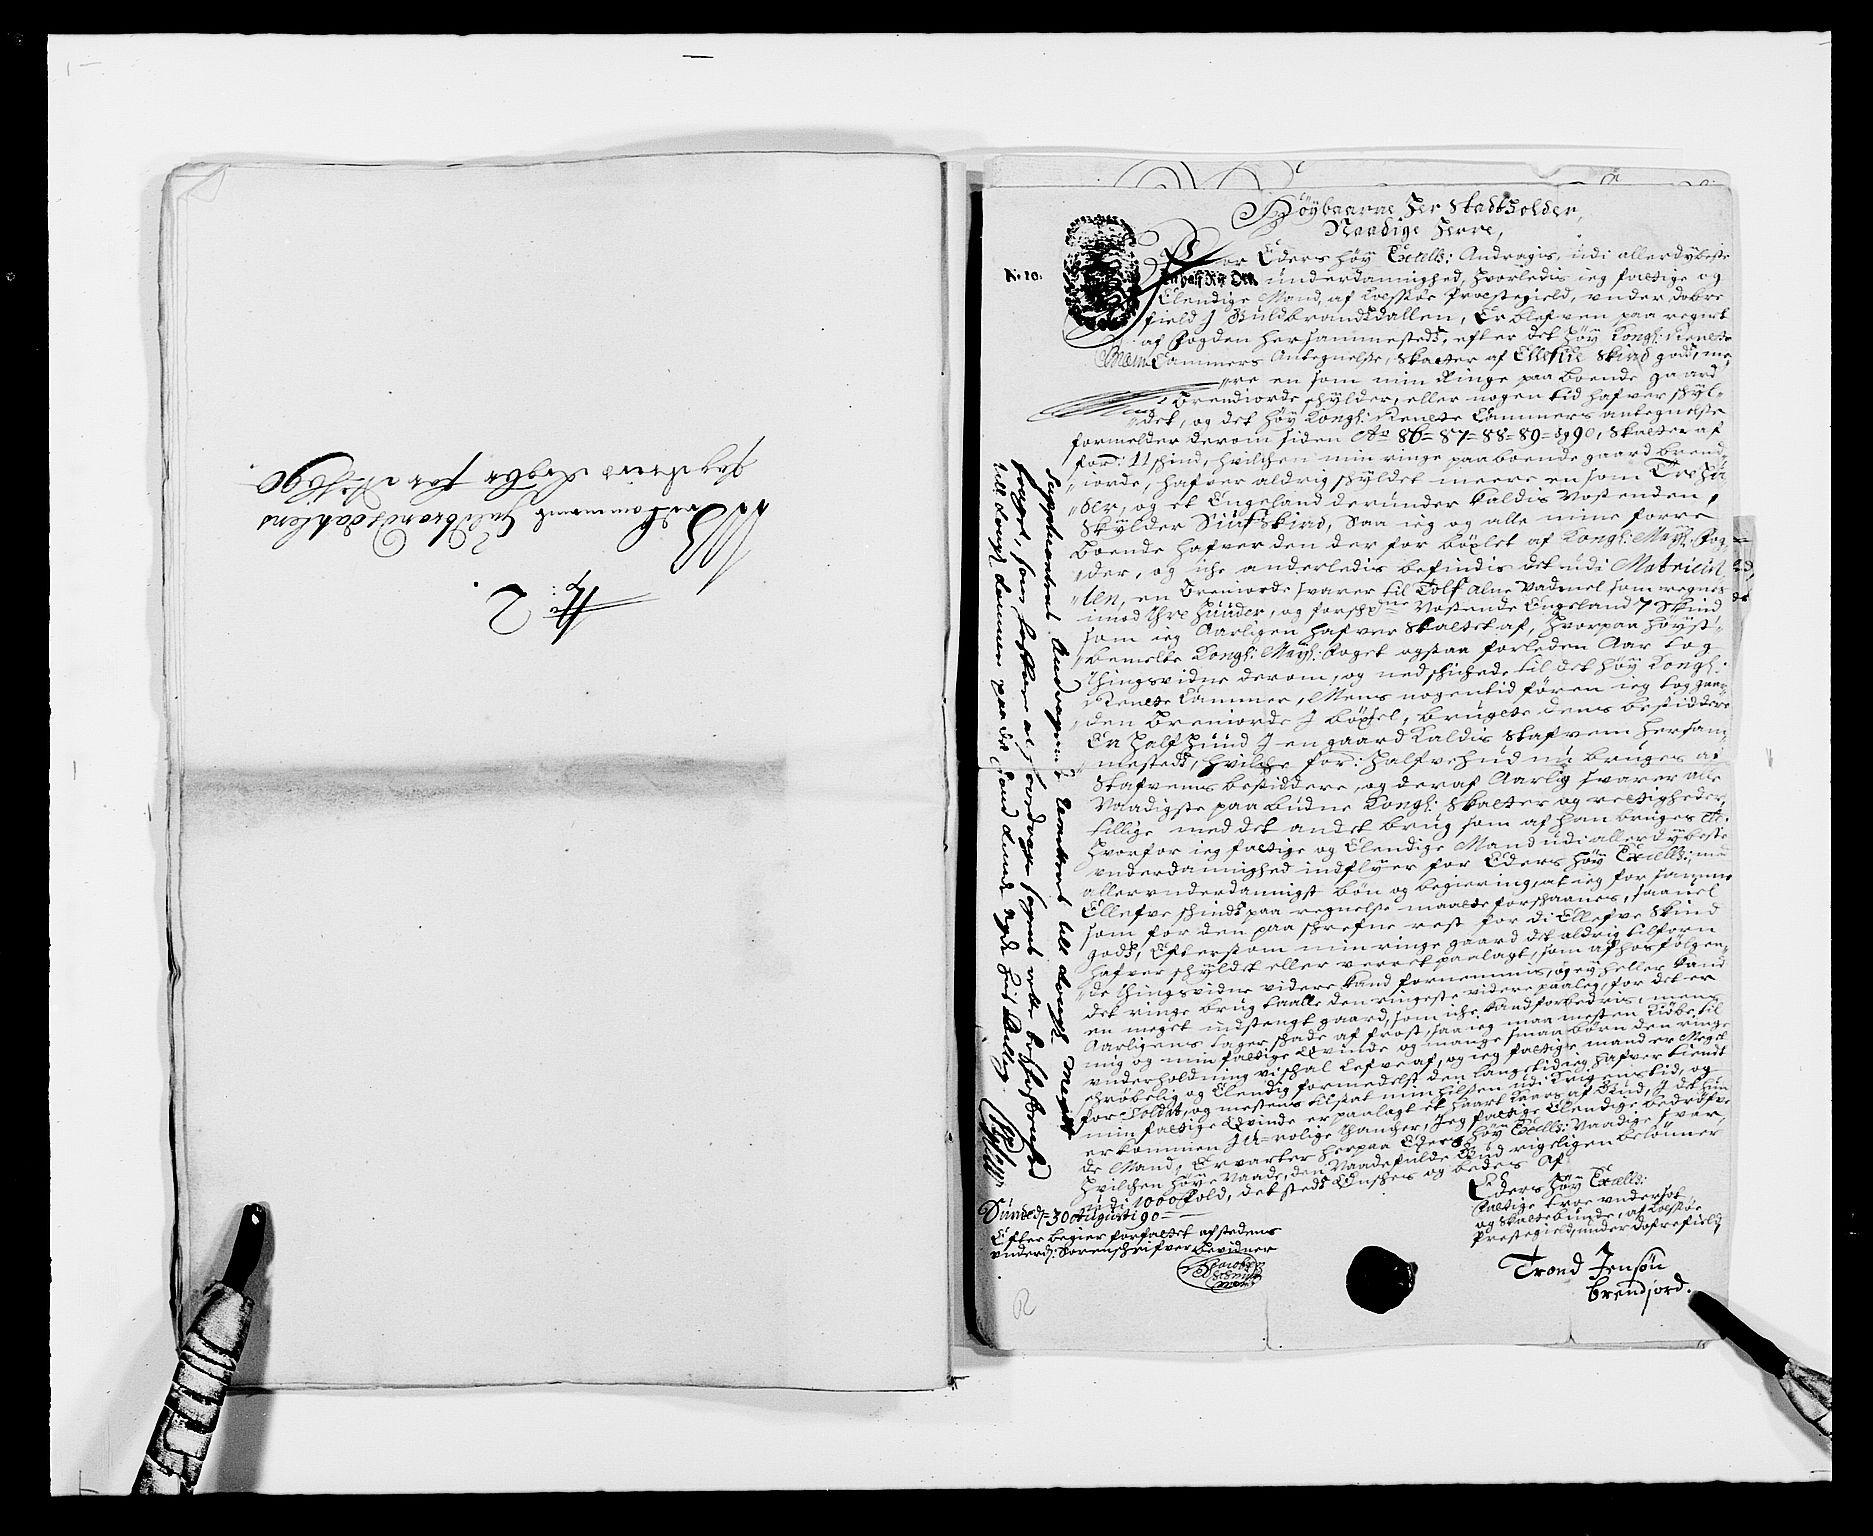 RA, Rentekammeret inntil 1814, Reviderte regnskaper, Fogderegnskap, R17/L1165: Fogderegnskap Gudbrandsdal, 1690-1692, s. 192